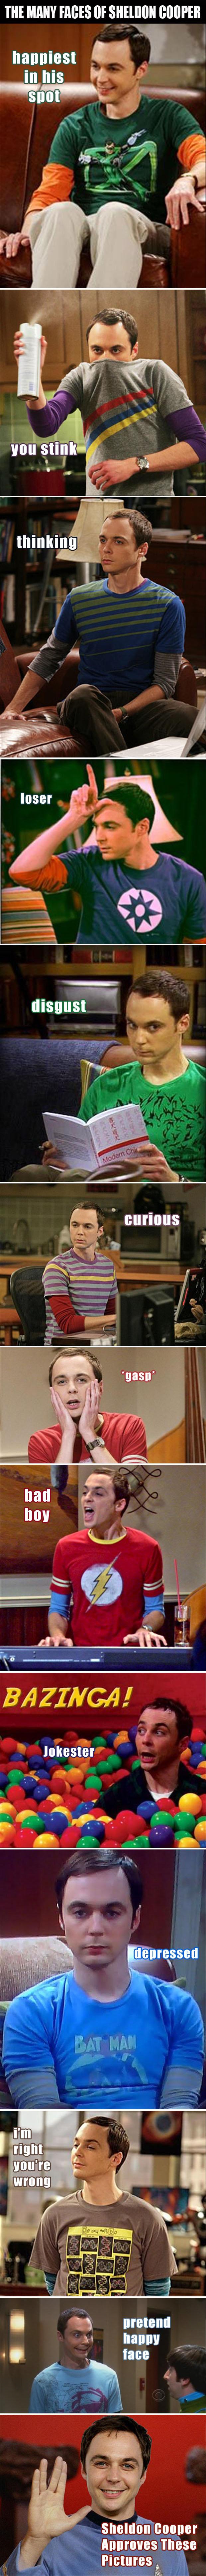 Sheldon Cooper funny faces